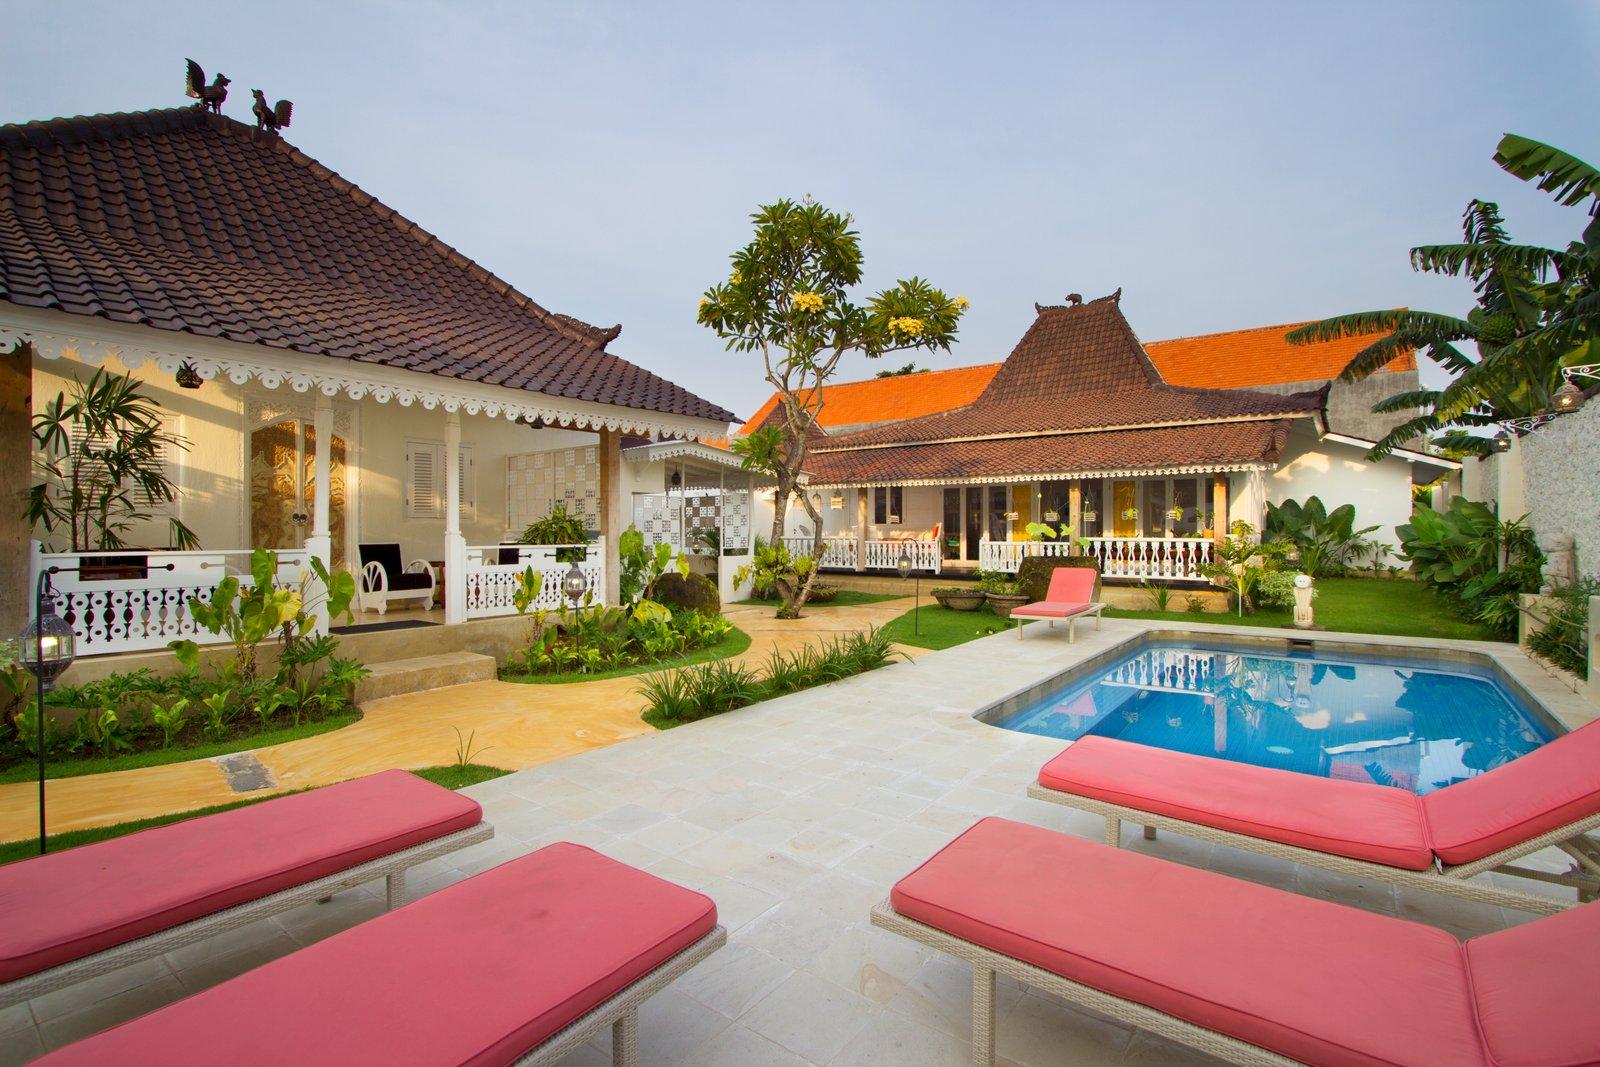 Hotel Puri Tempo Doloe Sanur, Penginapan yang Romantis dengan Konsep Cantik dan Minimalis